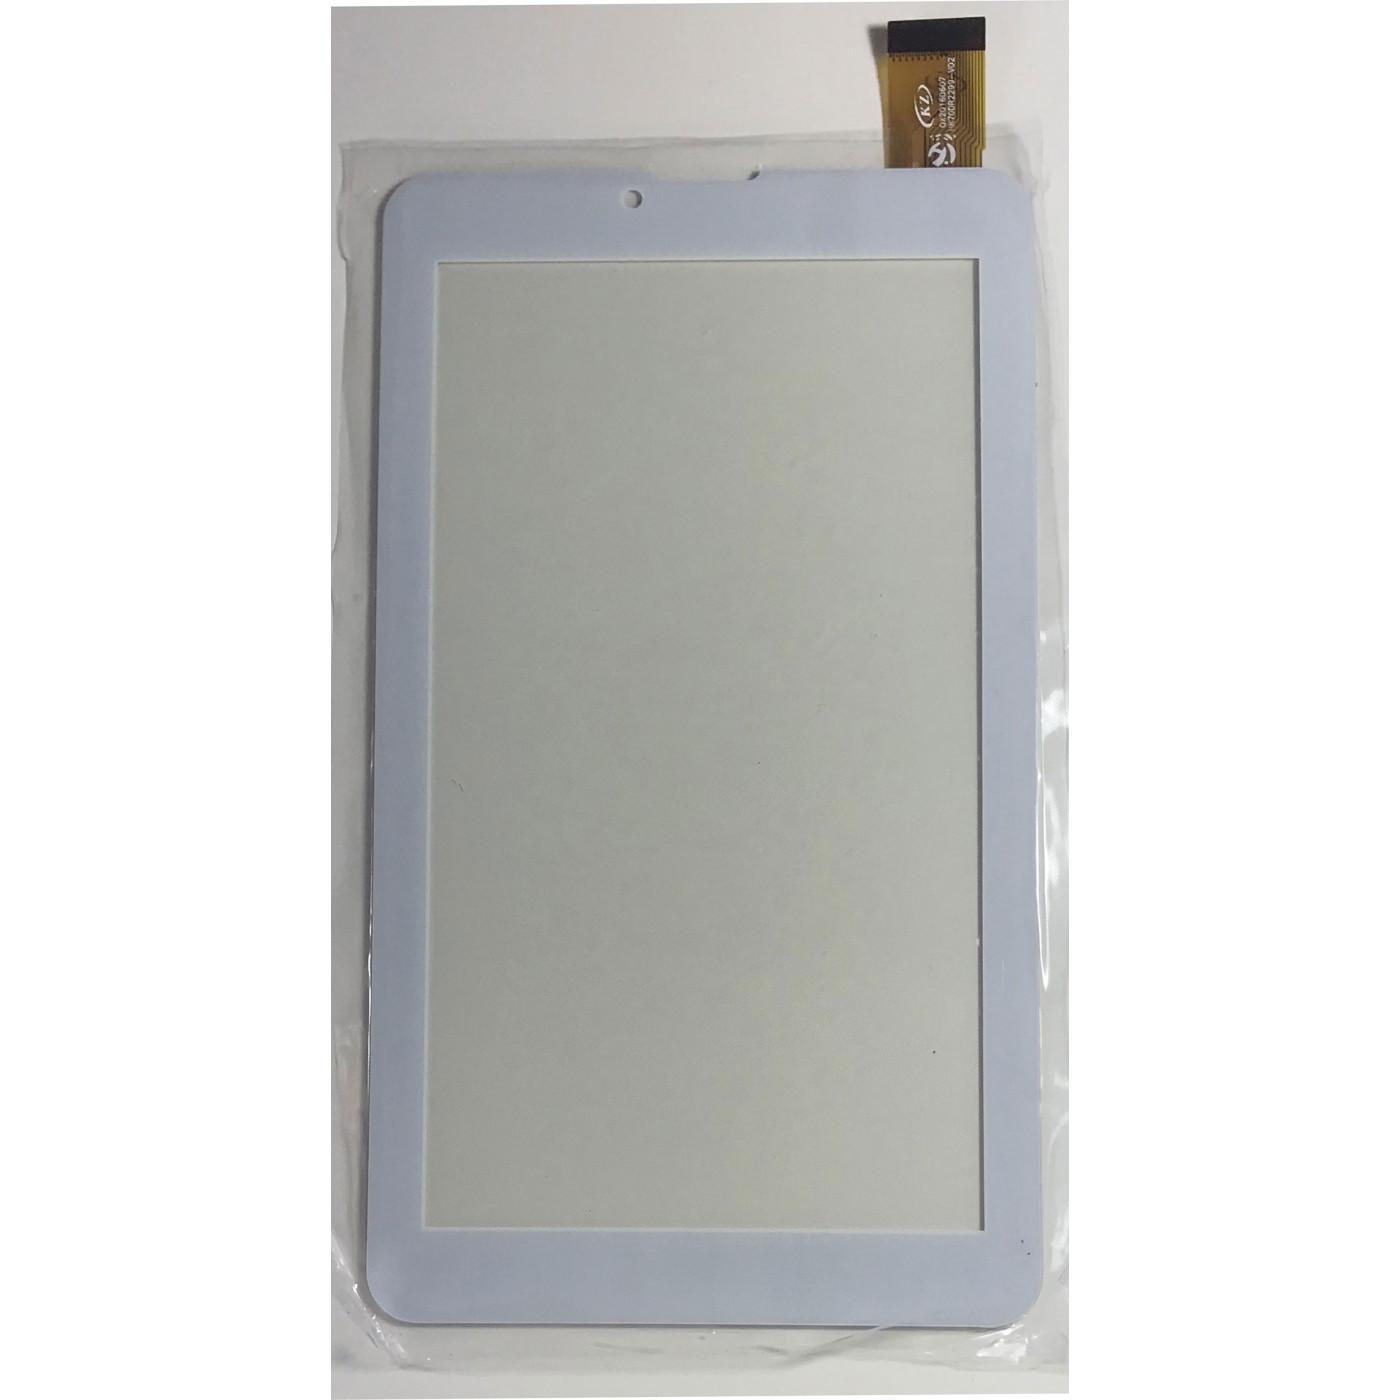 PANTALLA TÁCTIL Para el ecualizador digital de tableta TAB286HD 3G White GLASS 7.0 TAB 286 HD